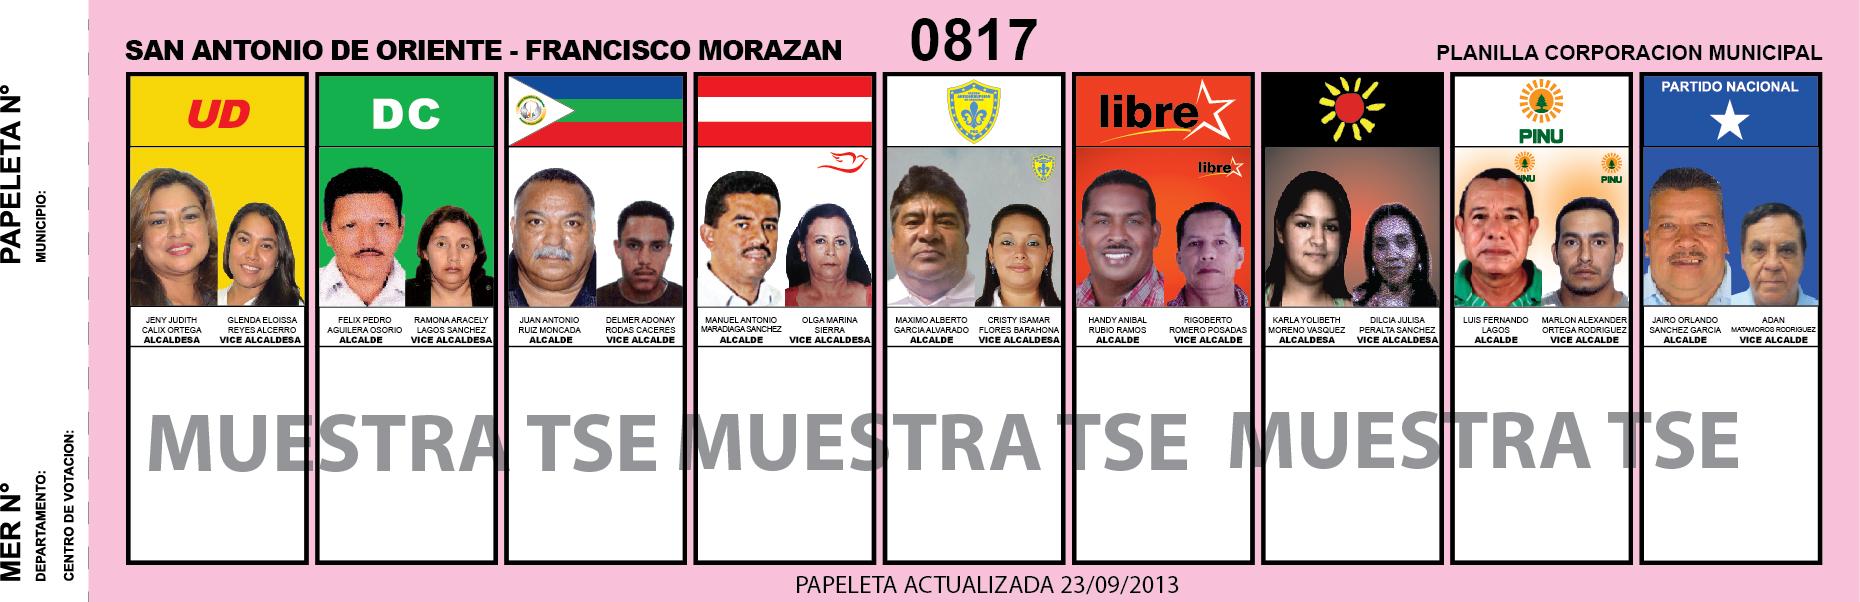 CANDIDATOS 2013 MUNICIPIO SAN ANTONIO DE ORIENTE - FRANCISCO MORAZAN - HONDURAS